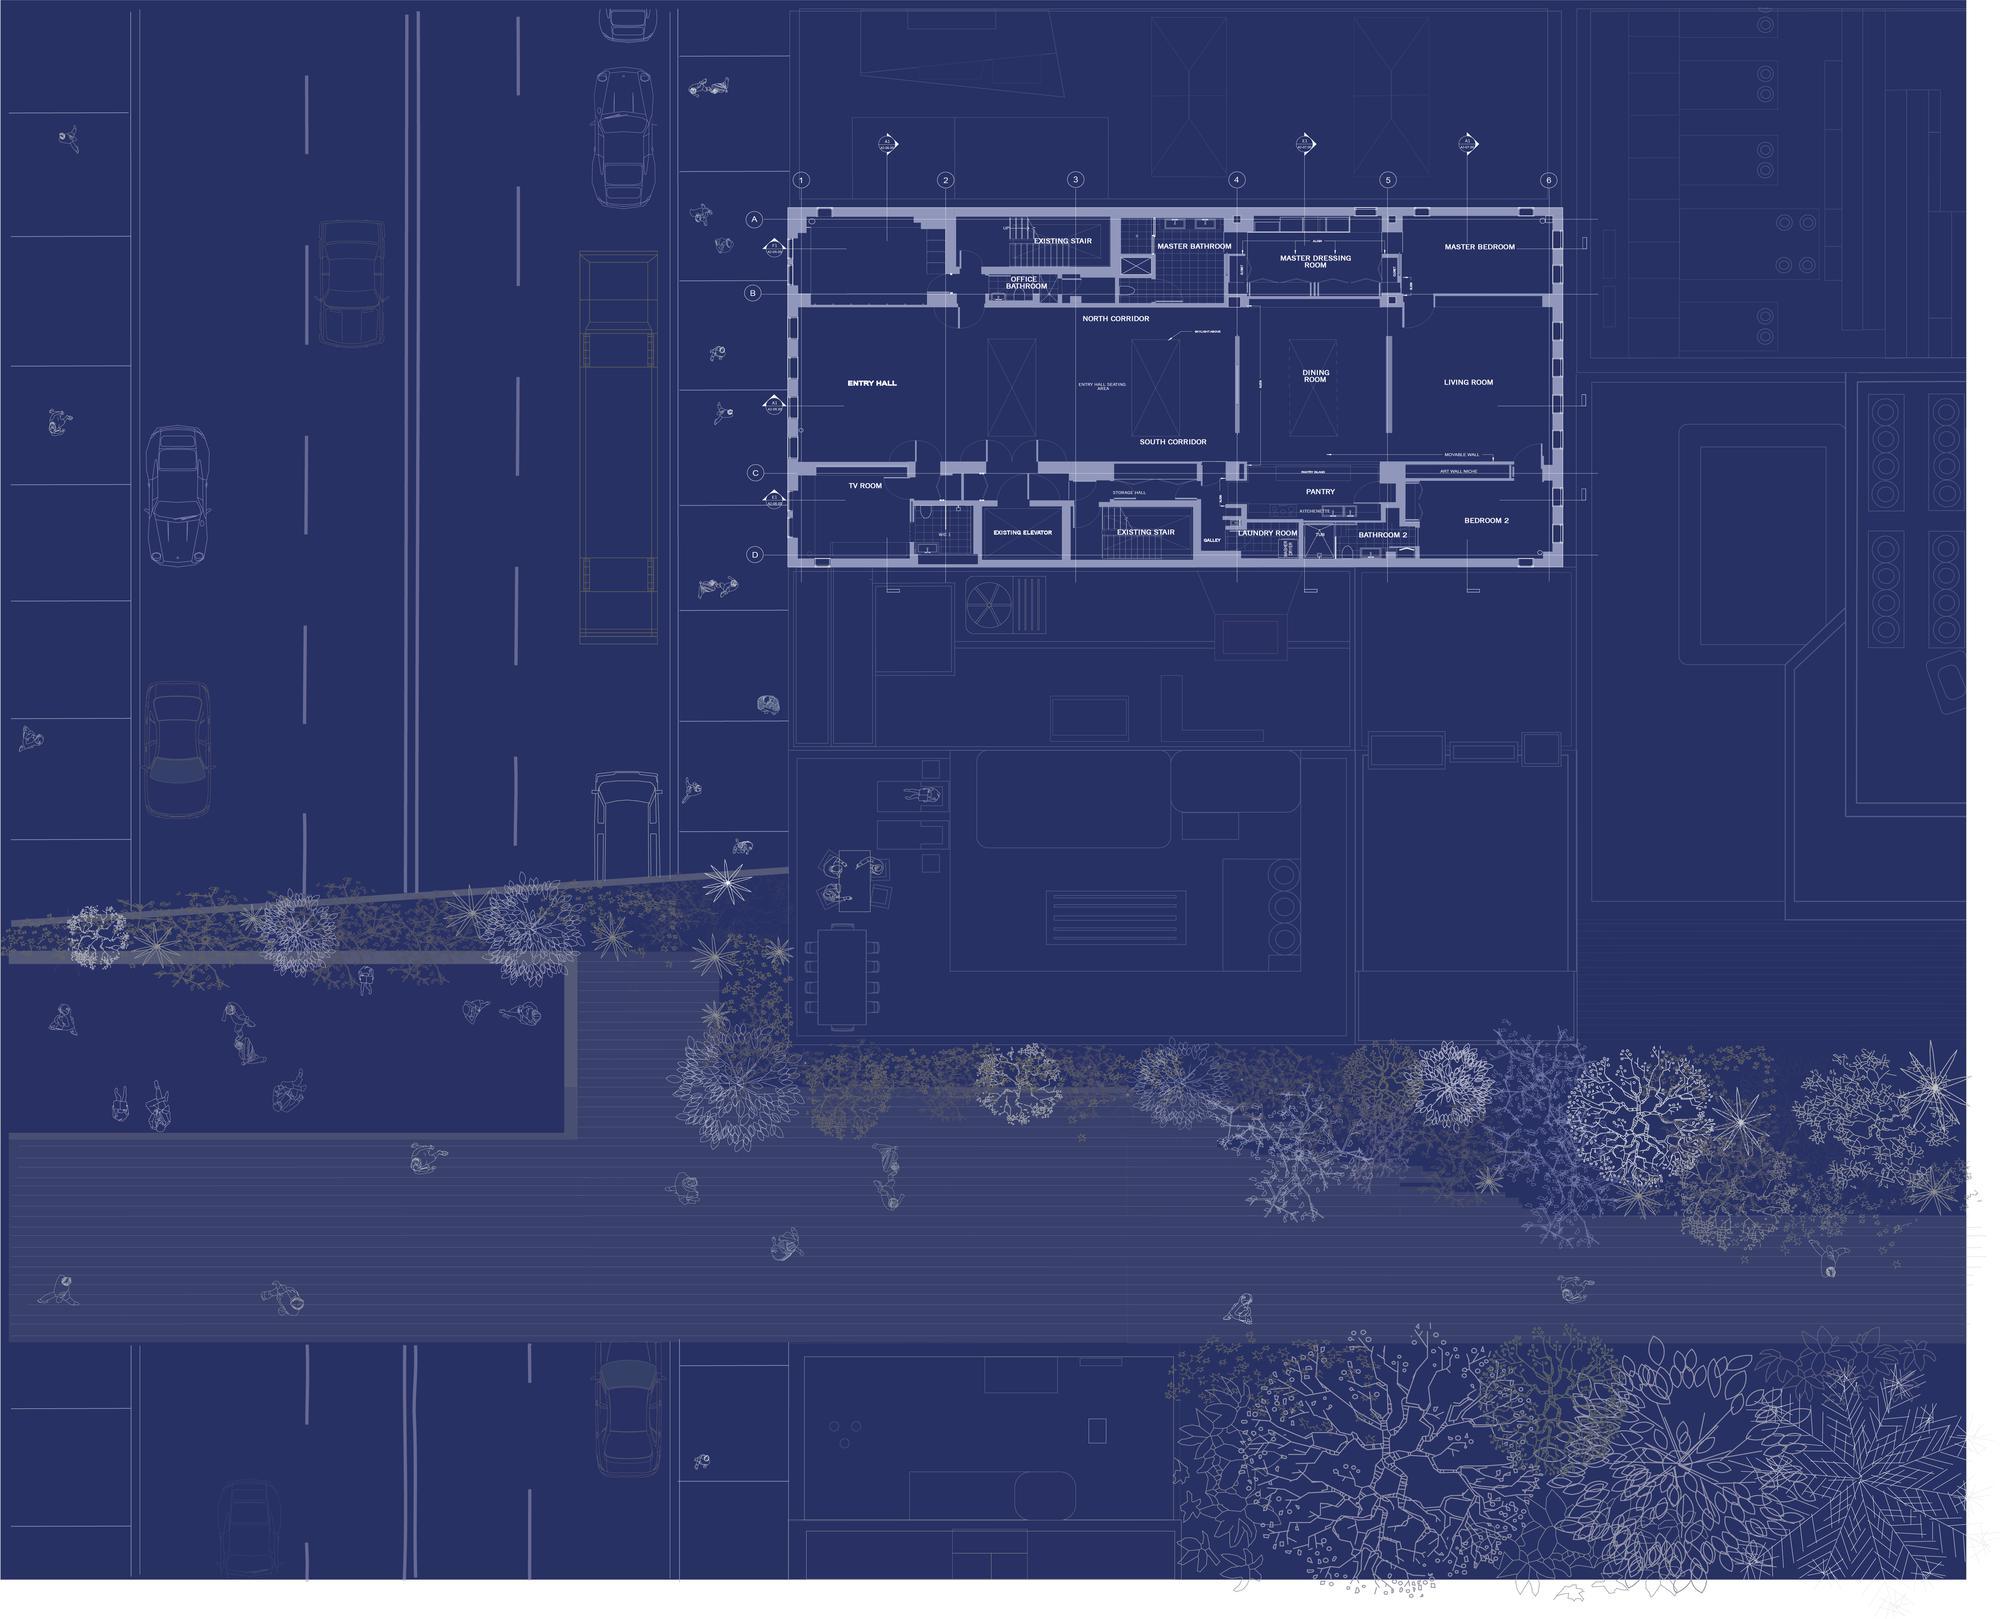 521W23-Central-Model-Floor-Plan-In-Context-WEB-1 strategic design consultancy